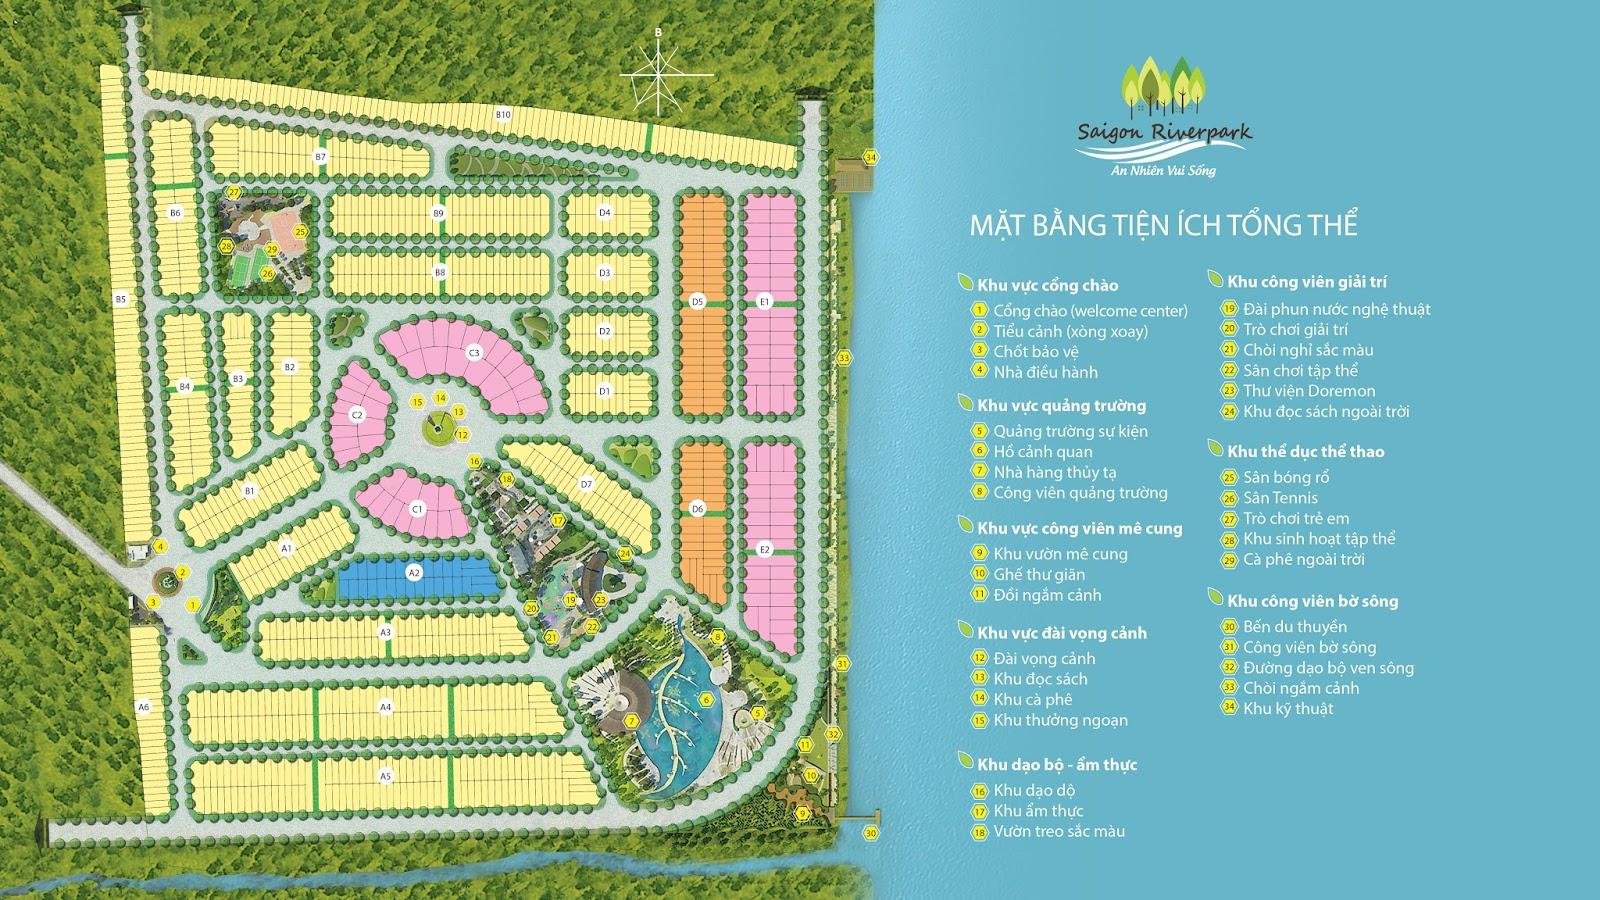 mat-bang-phan-lo-saigon-river-park